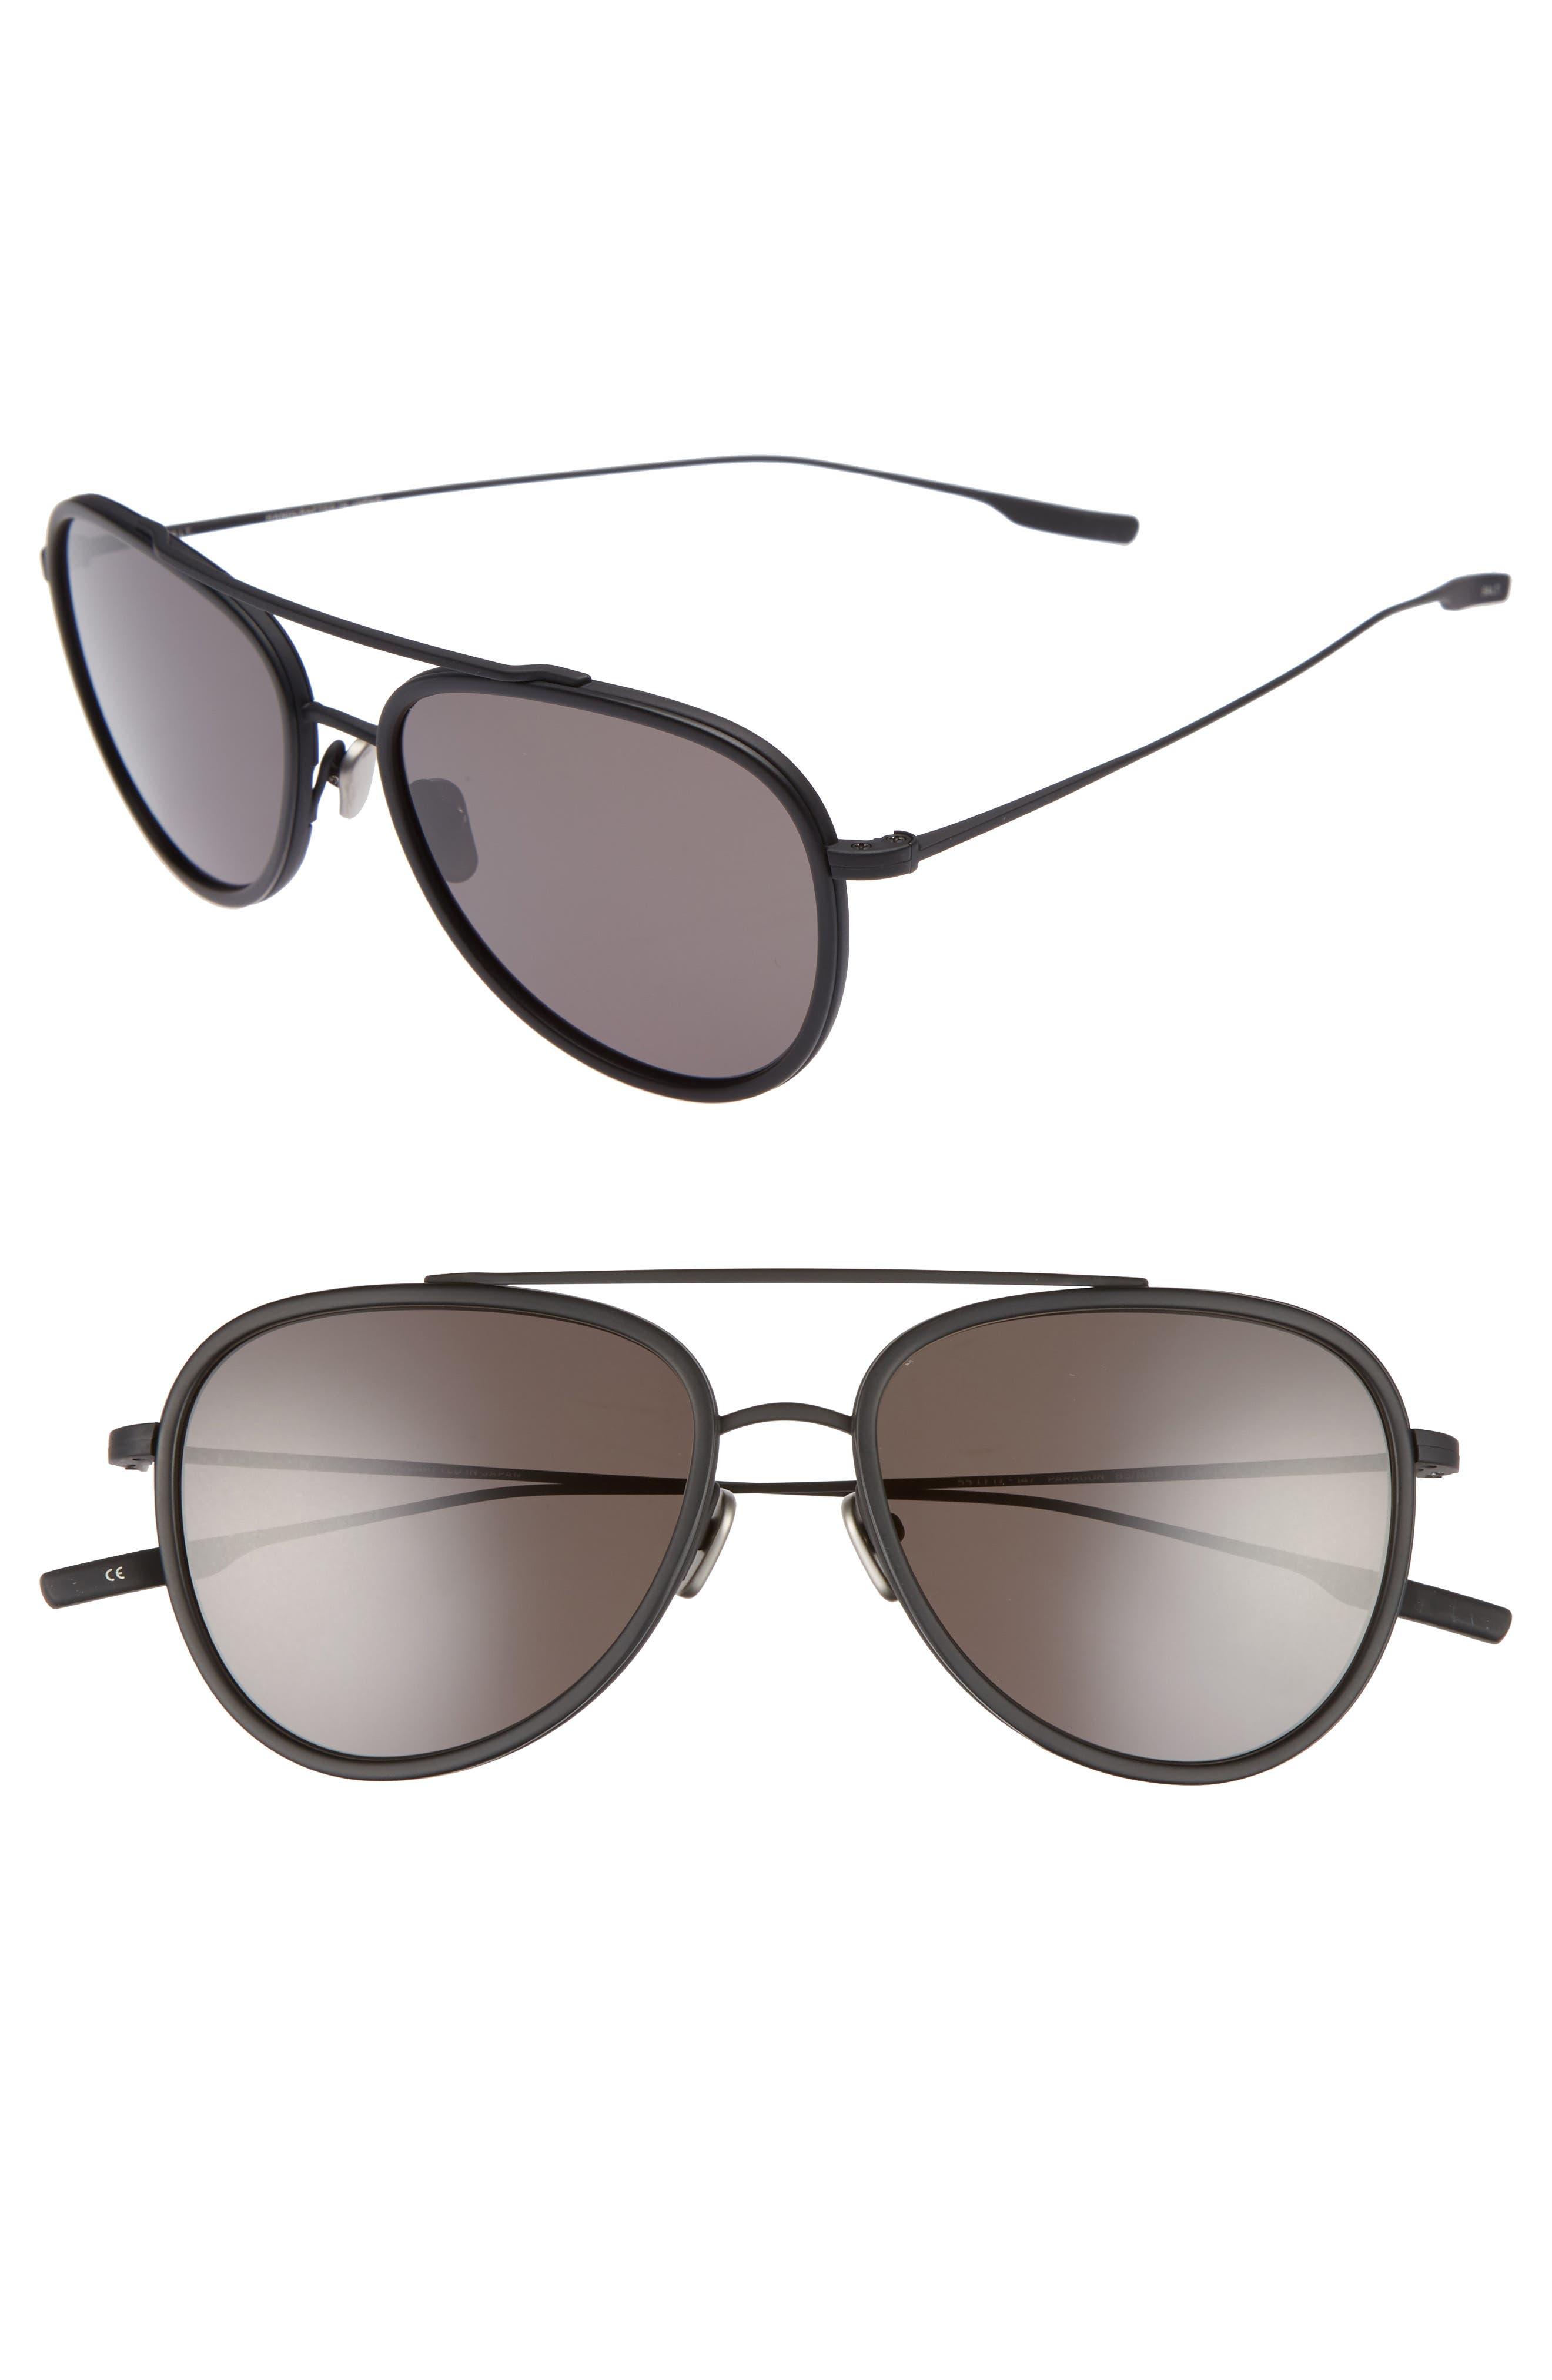 Paragon 55mm Polarized Aviator Sunglasses,                         Main,                         color, Black Sand/ Matte Black